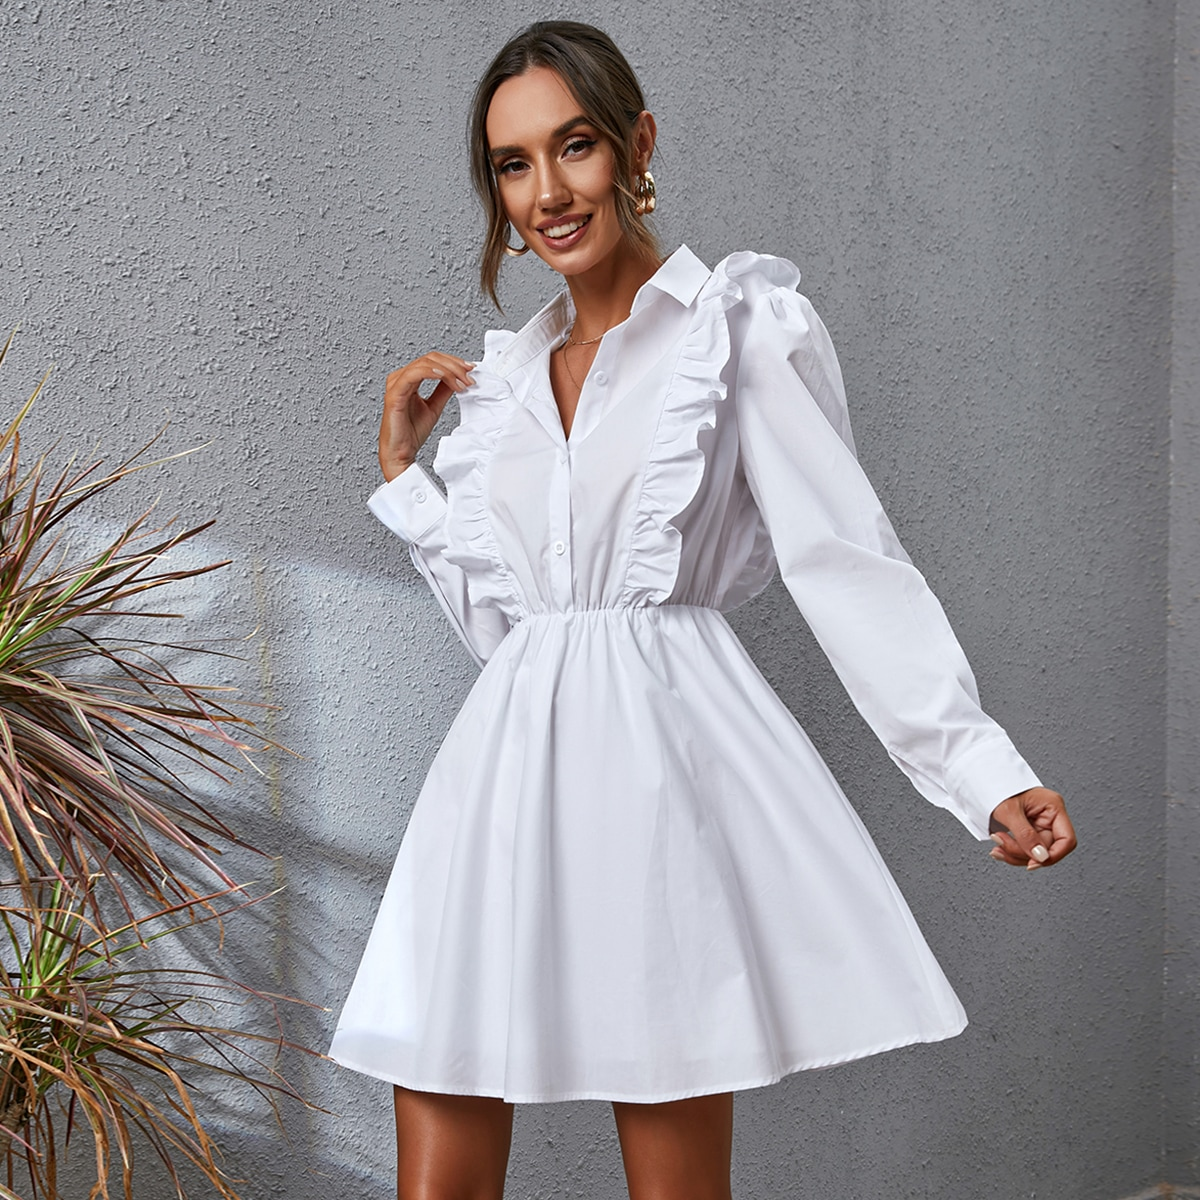 Solid Ruffle Trim Shirt Dress